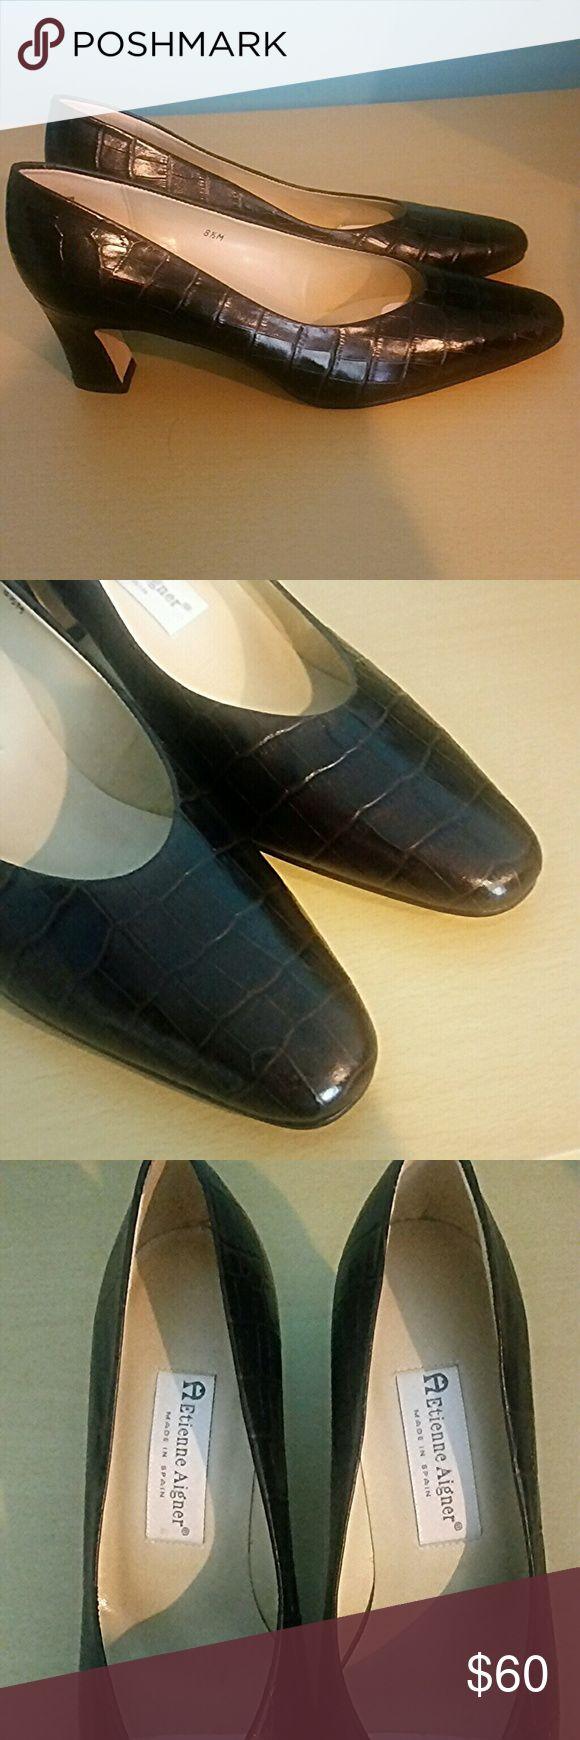 Etienne Aigner Leather Crocodile Patterned Heels Gorgeous Etienne Aigner Taylor dark brown leather crocodile patterned heels. New. 2.5 inch heel. Leather upper. Made in Spain. Etienne Aigner Shoes Heels